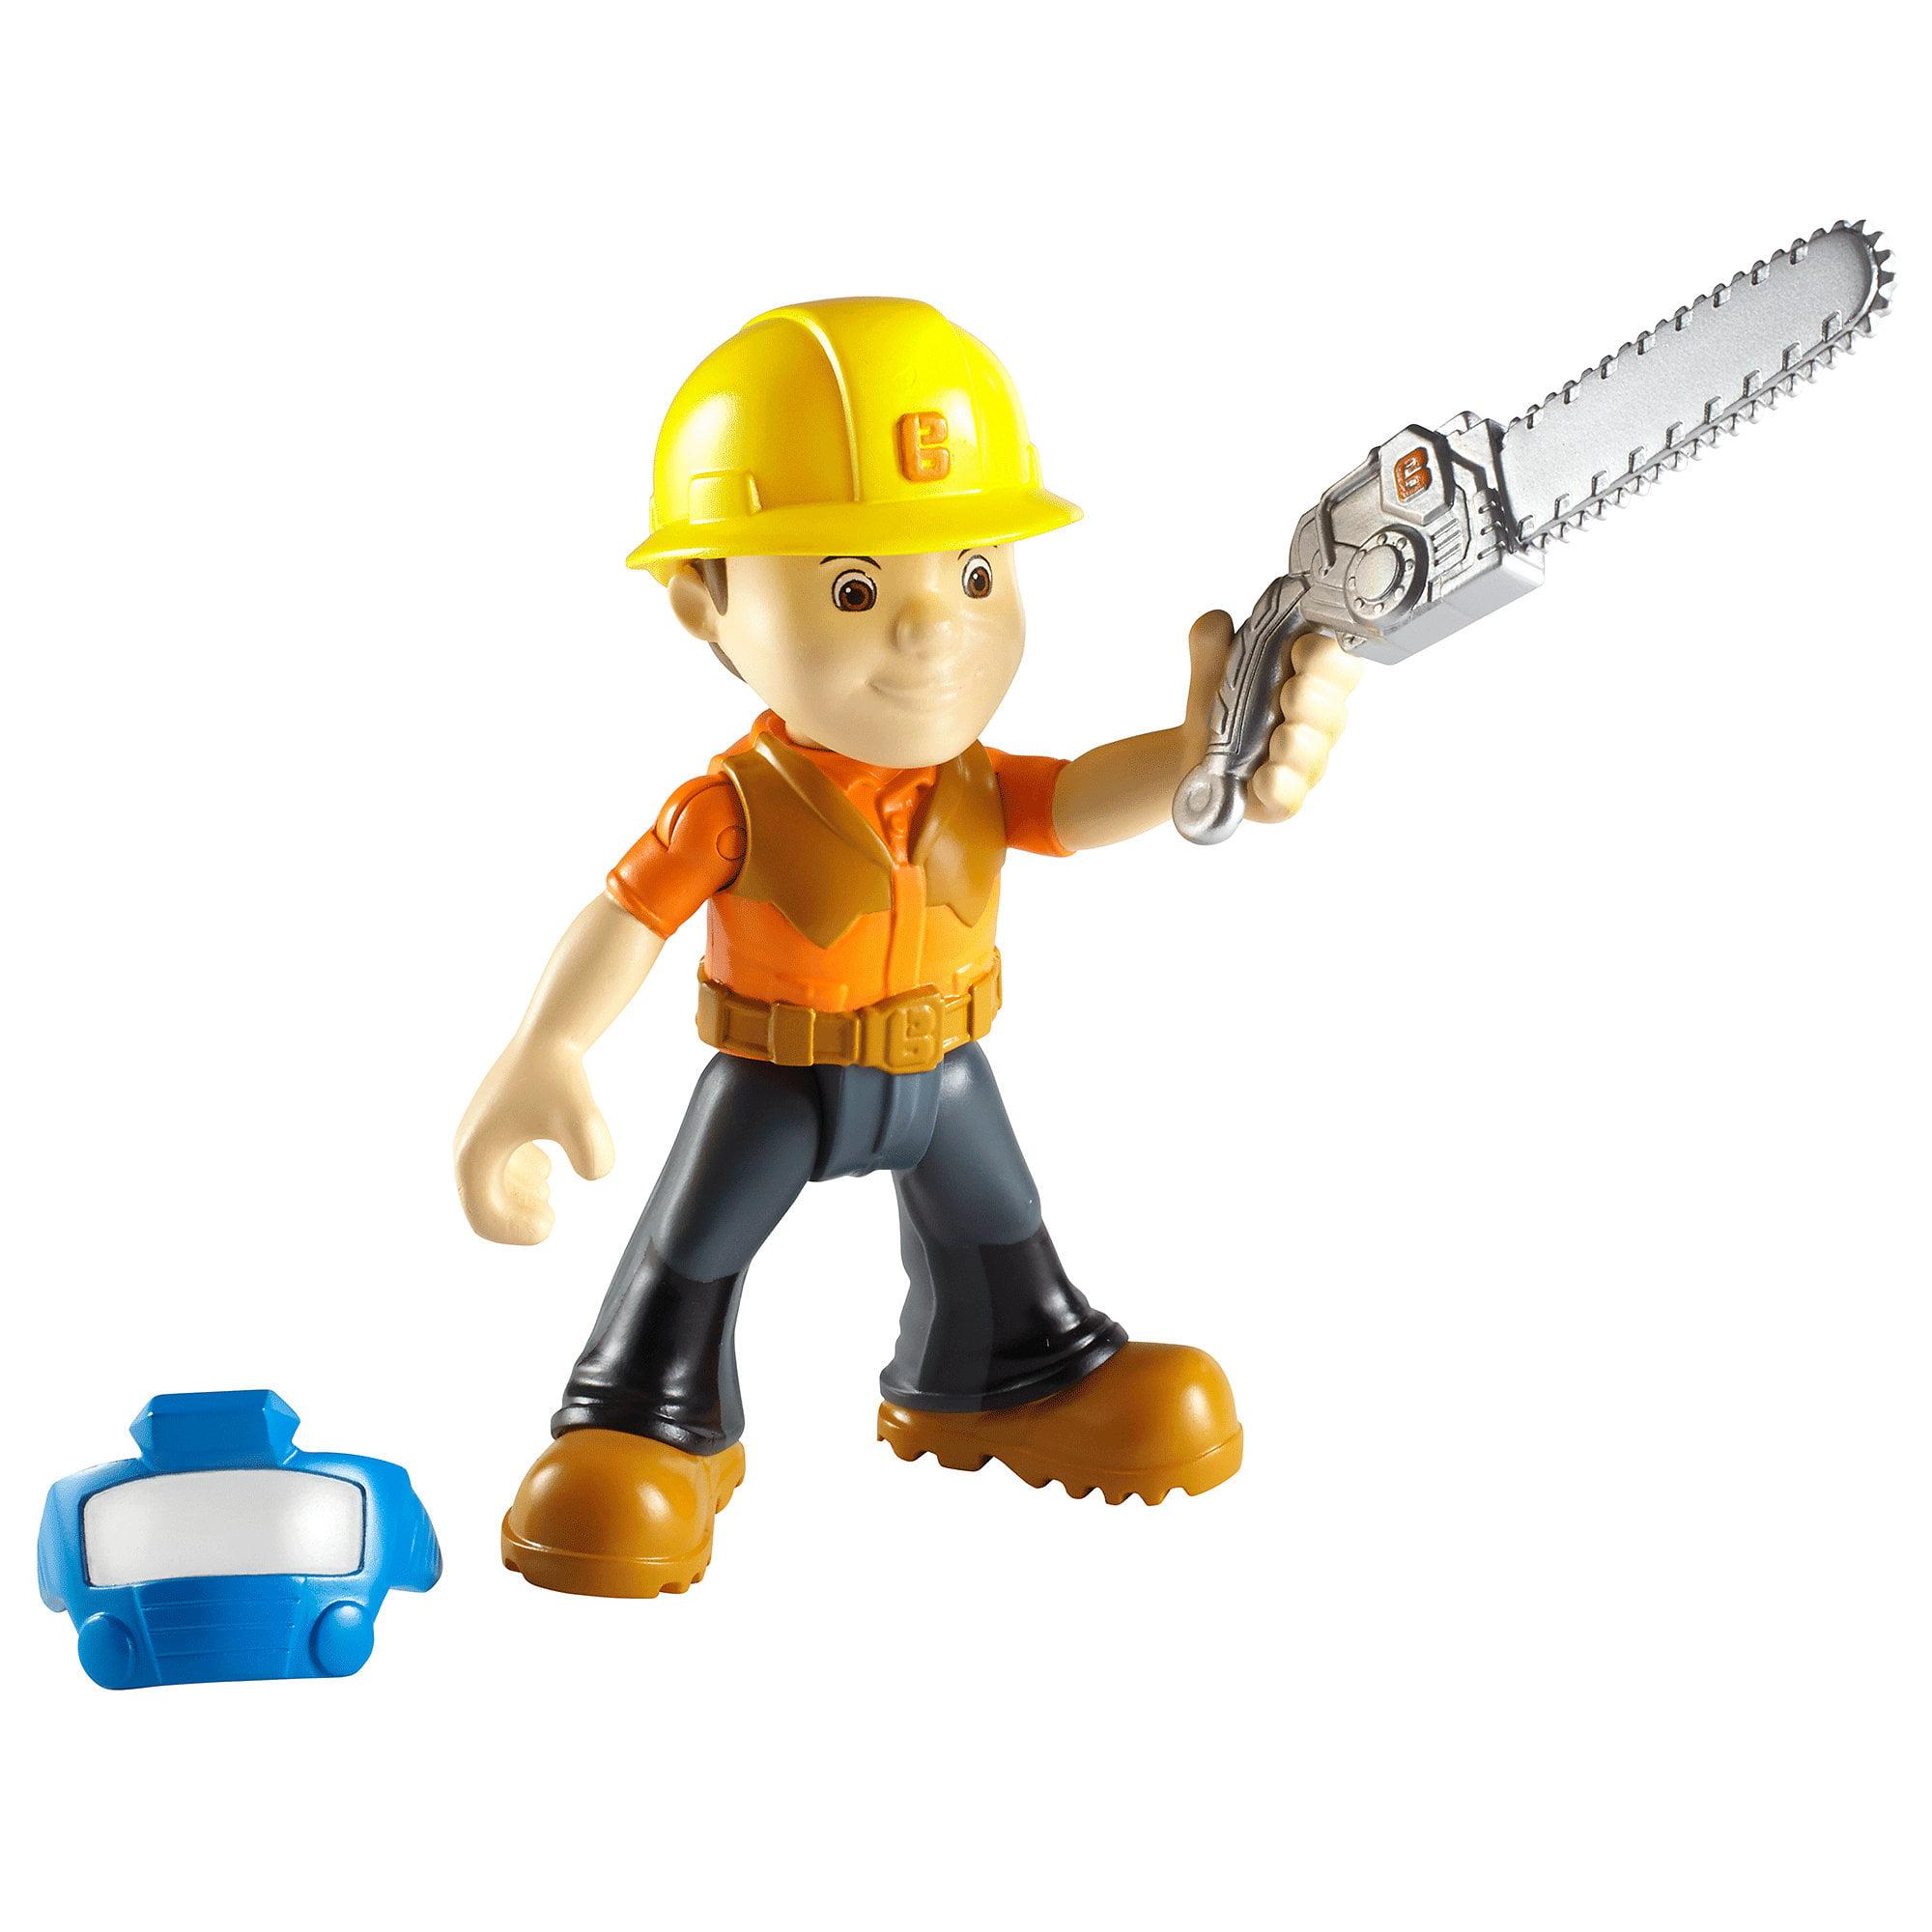 Fisher Price Bob the Builder Lumberjack Bob by Fisher-Price